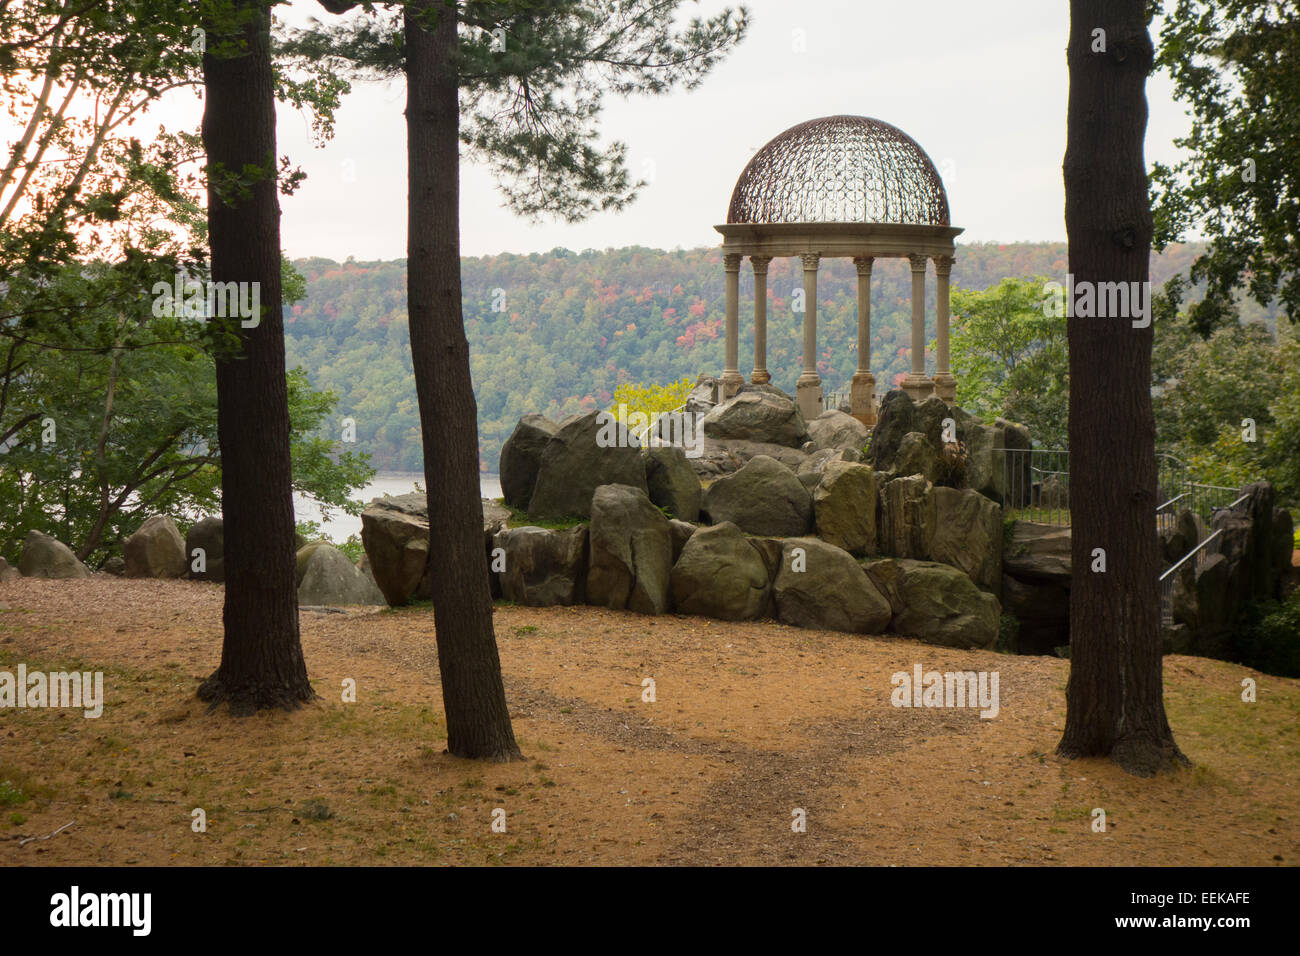 Untermyer Gardens Conservancy In Yonkers Ny Stock Photo 77872018